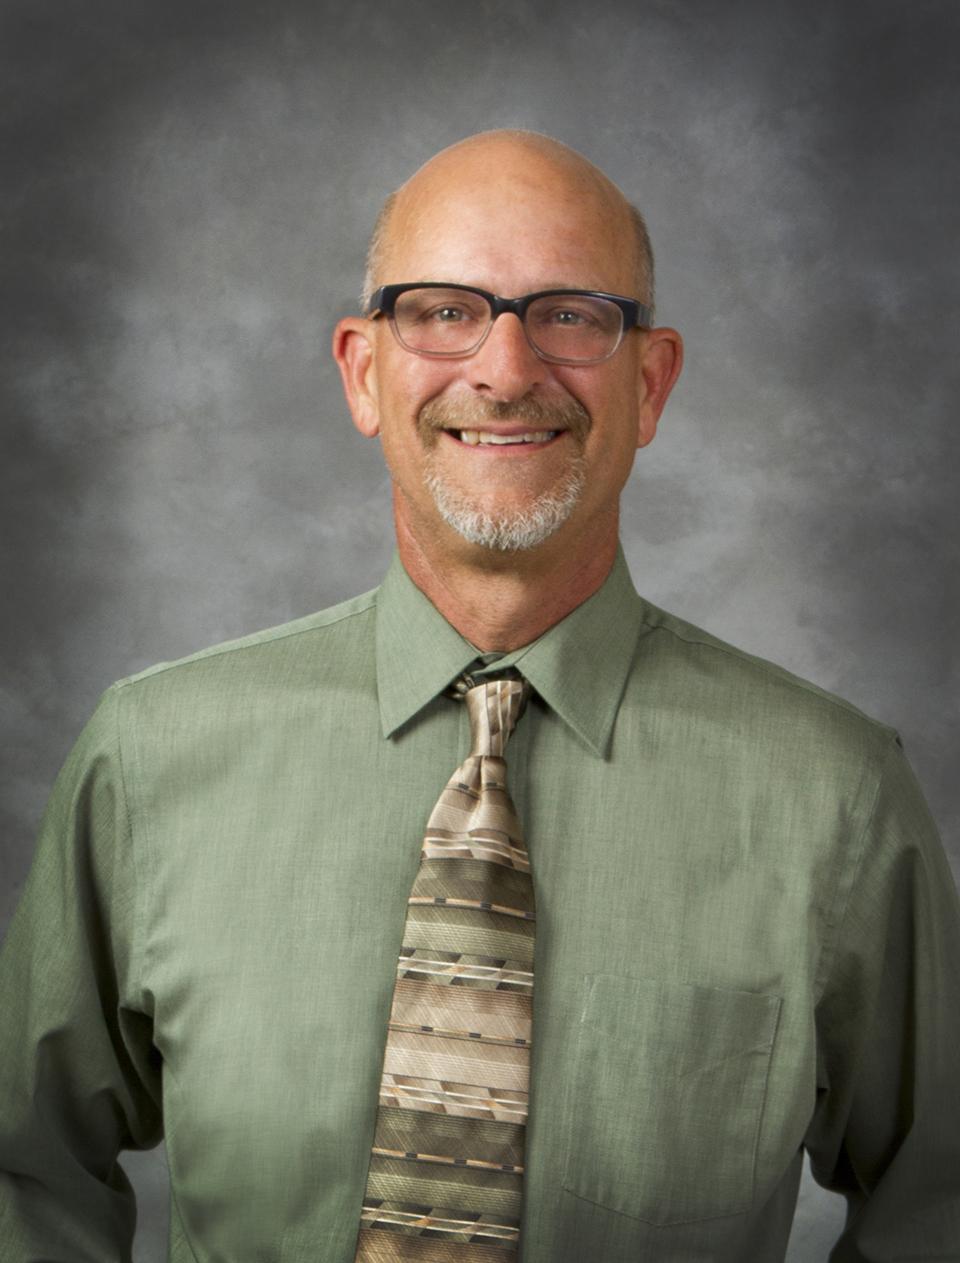 Keith Crist